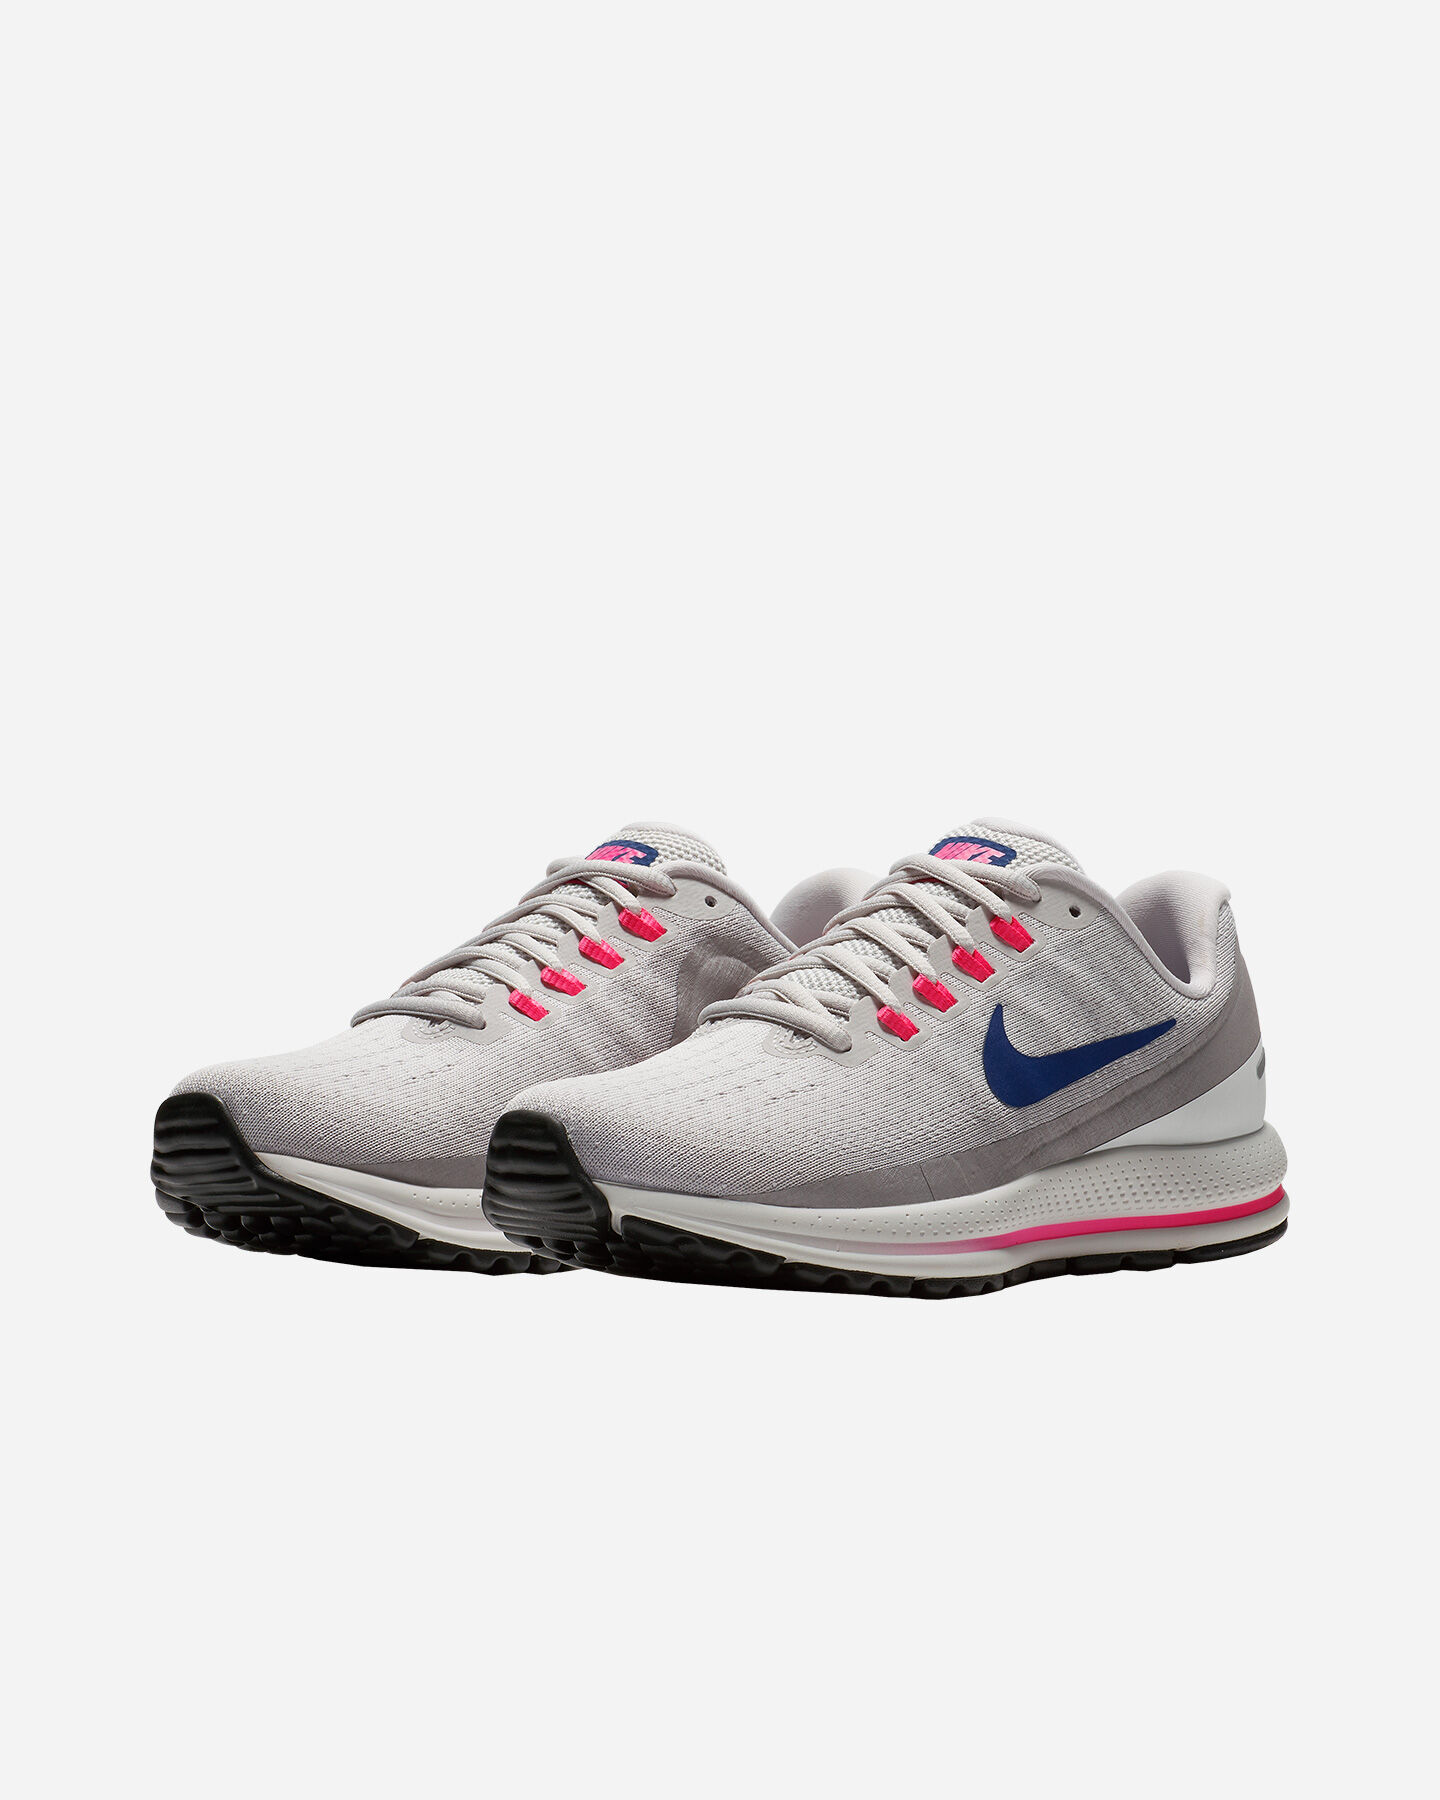 Sport Zoom 922909 Air Nike Running 009 13 W Vomero Cisalfa Scarpe Su nqBwwPfg